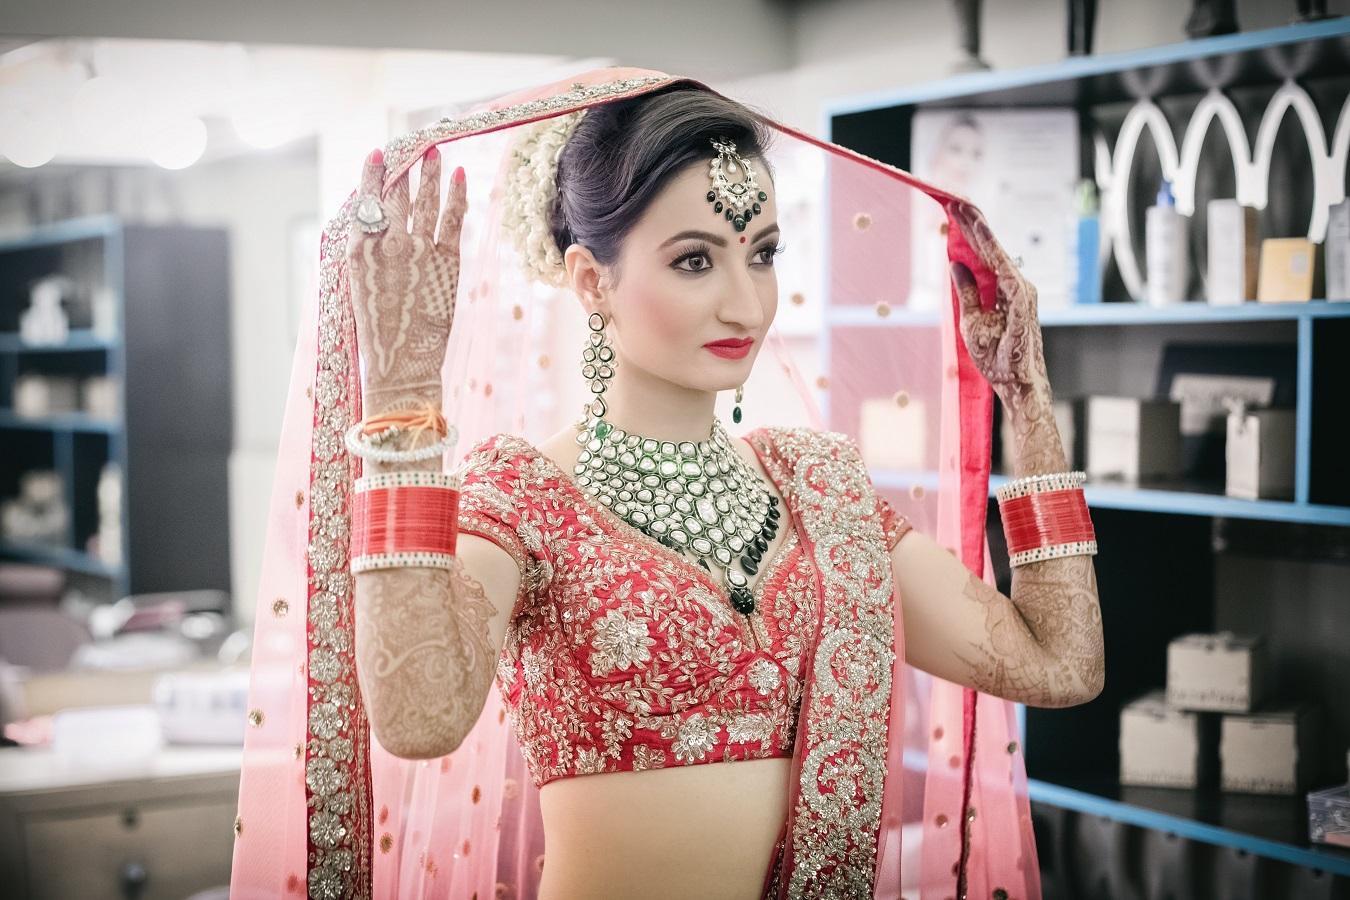 Bride under Veil Poses